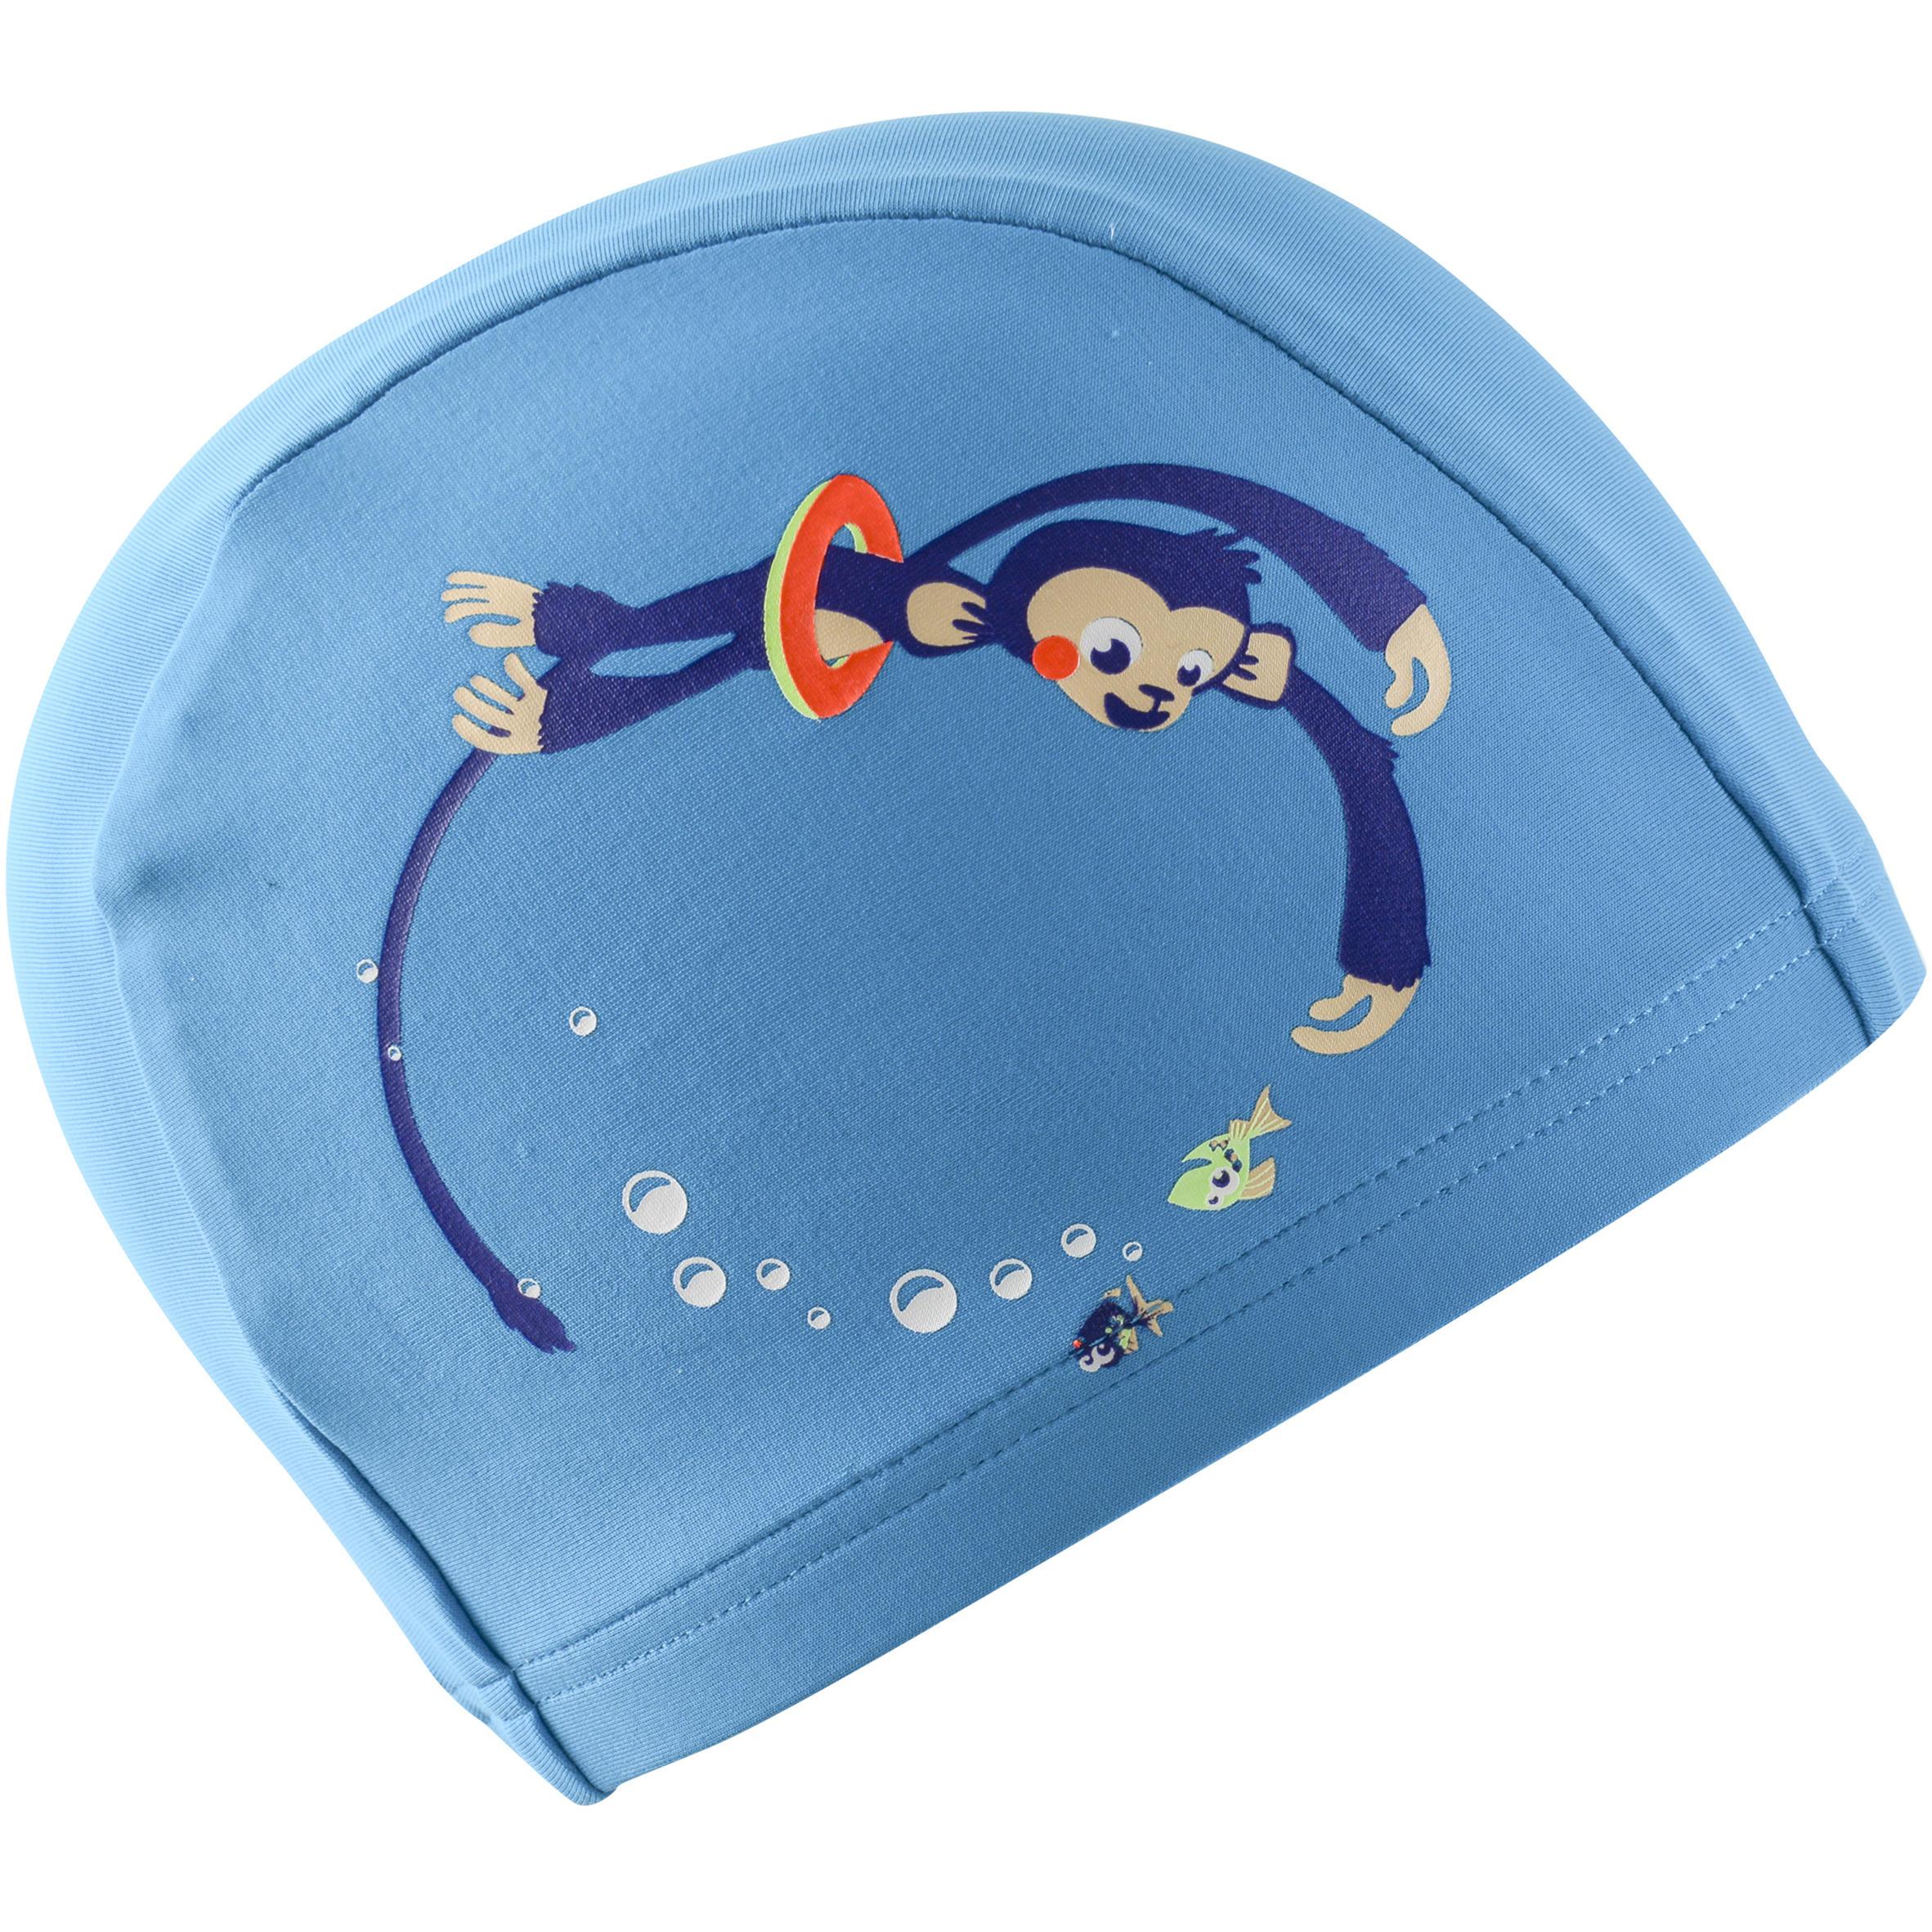 Swim Cap Mesh- Printed Monkey Blue